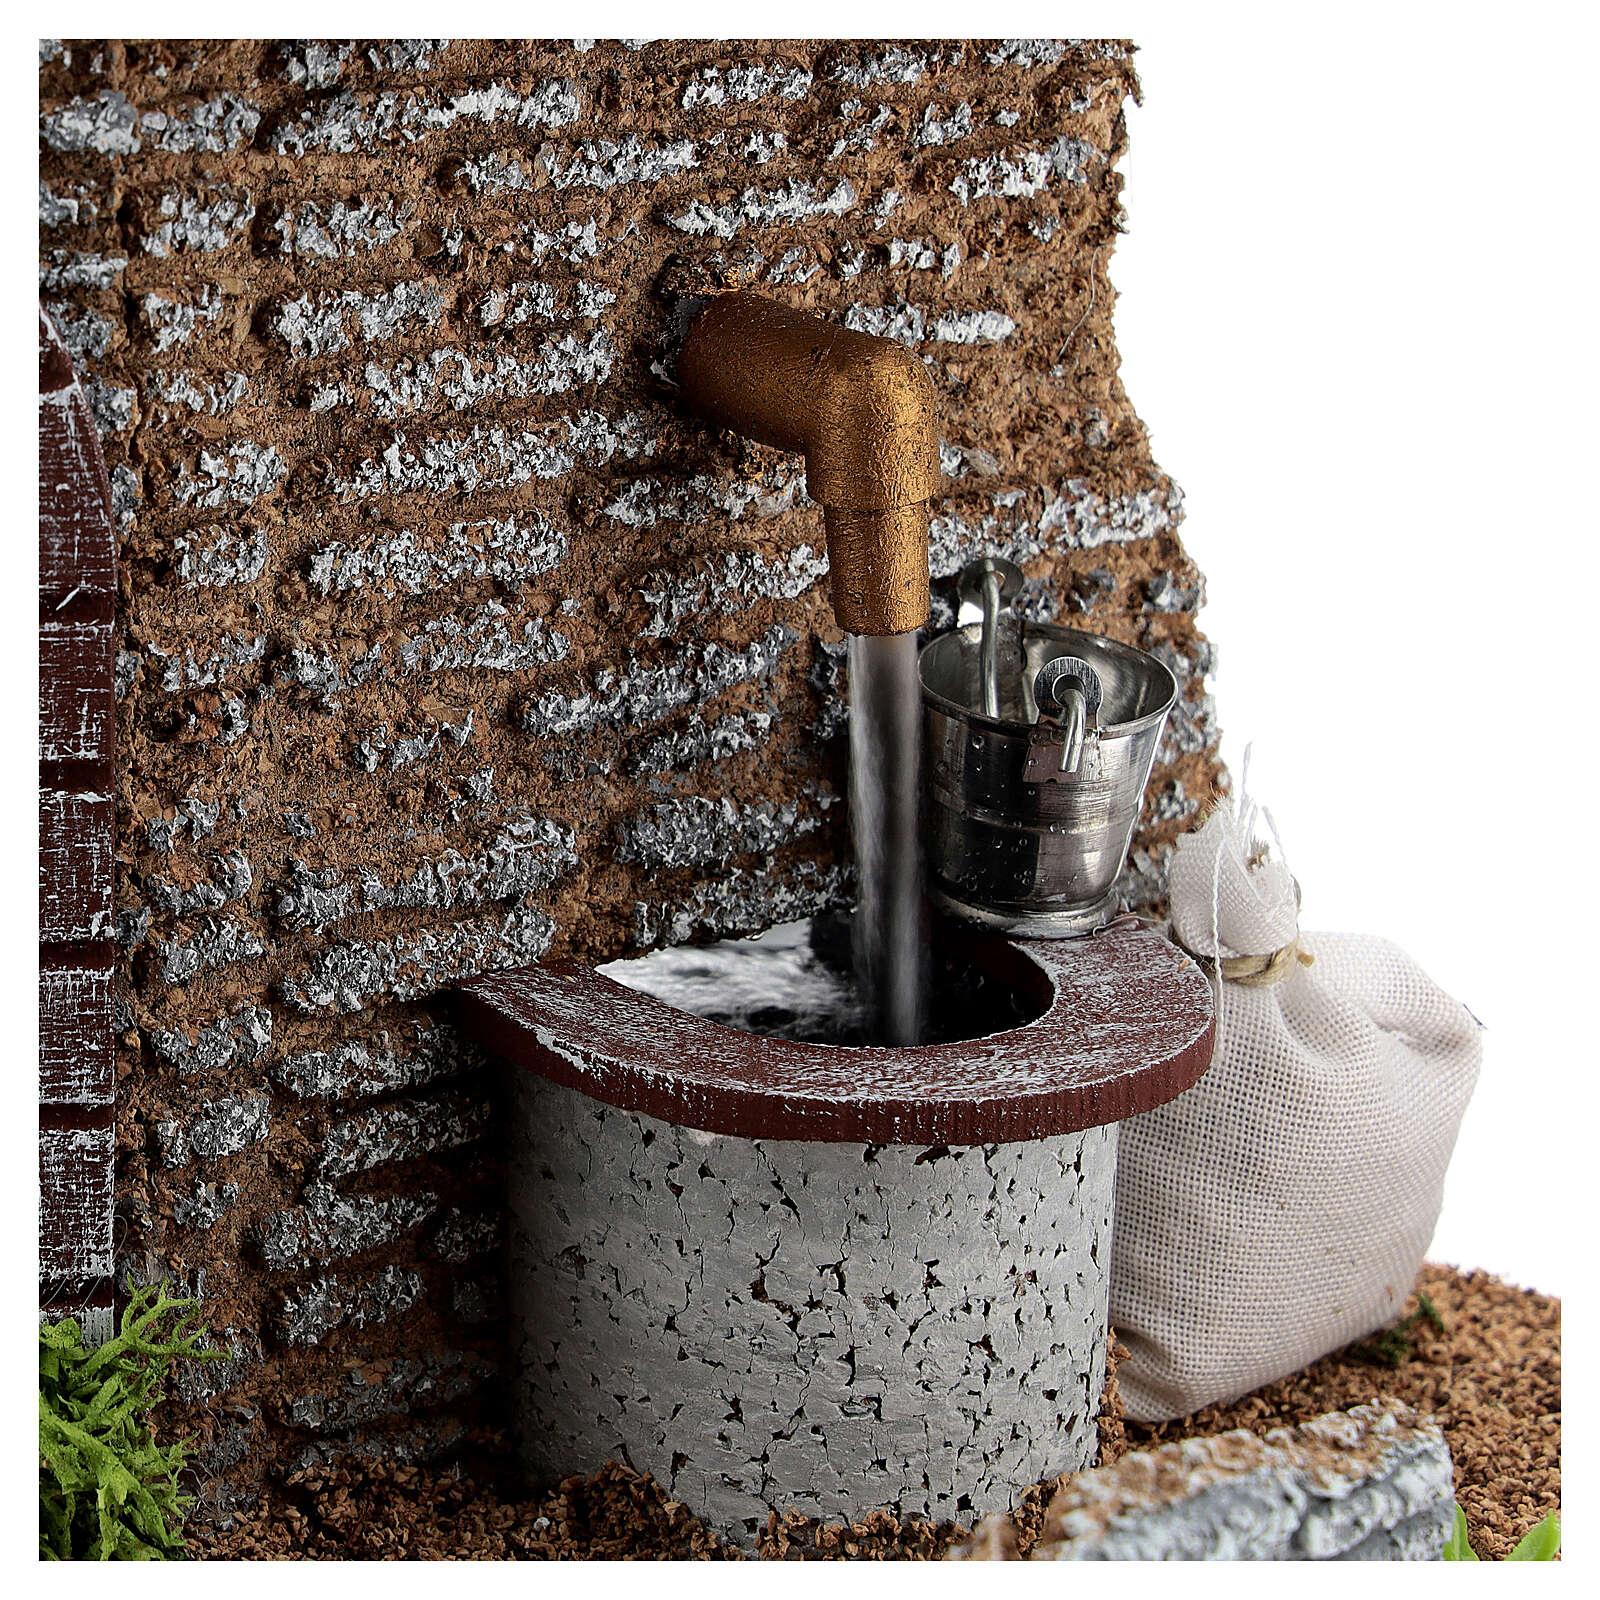 Fontana pompa funzionante 15x15x15 cm presepi 8-10 cm 4